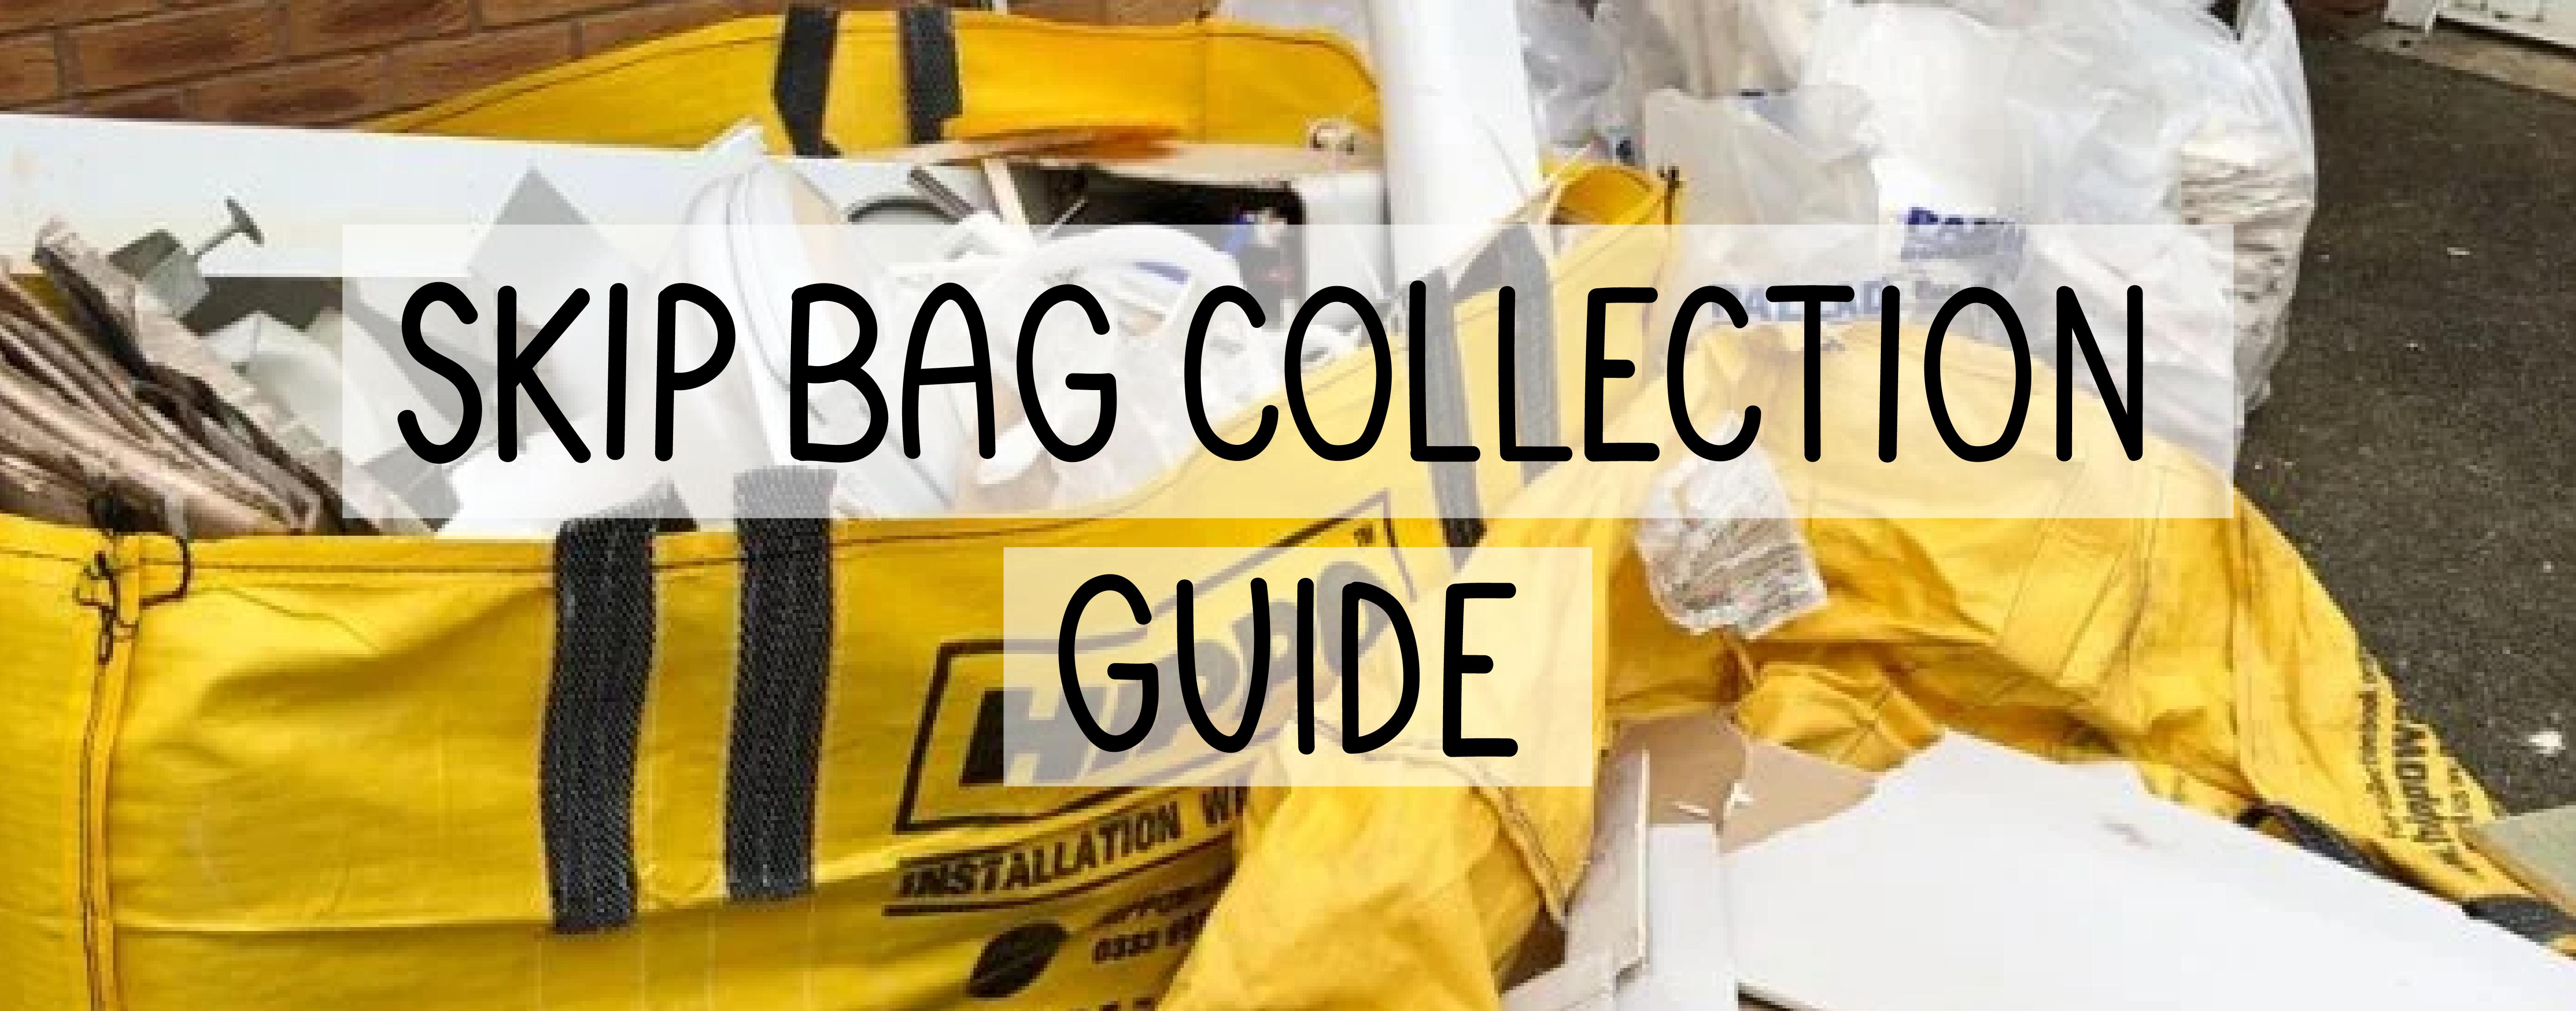 skip bag hippo bag collection guide how a skip bag works